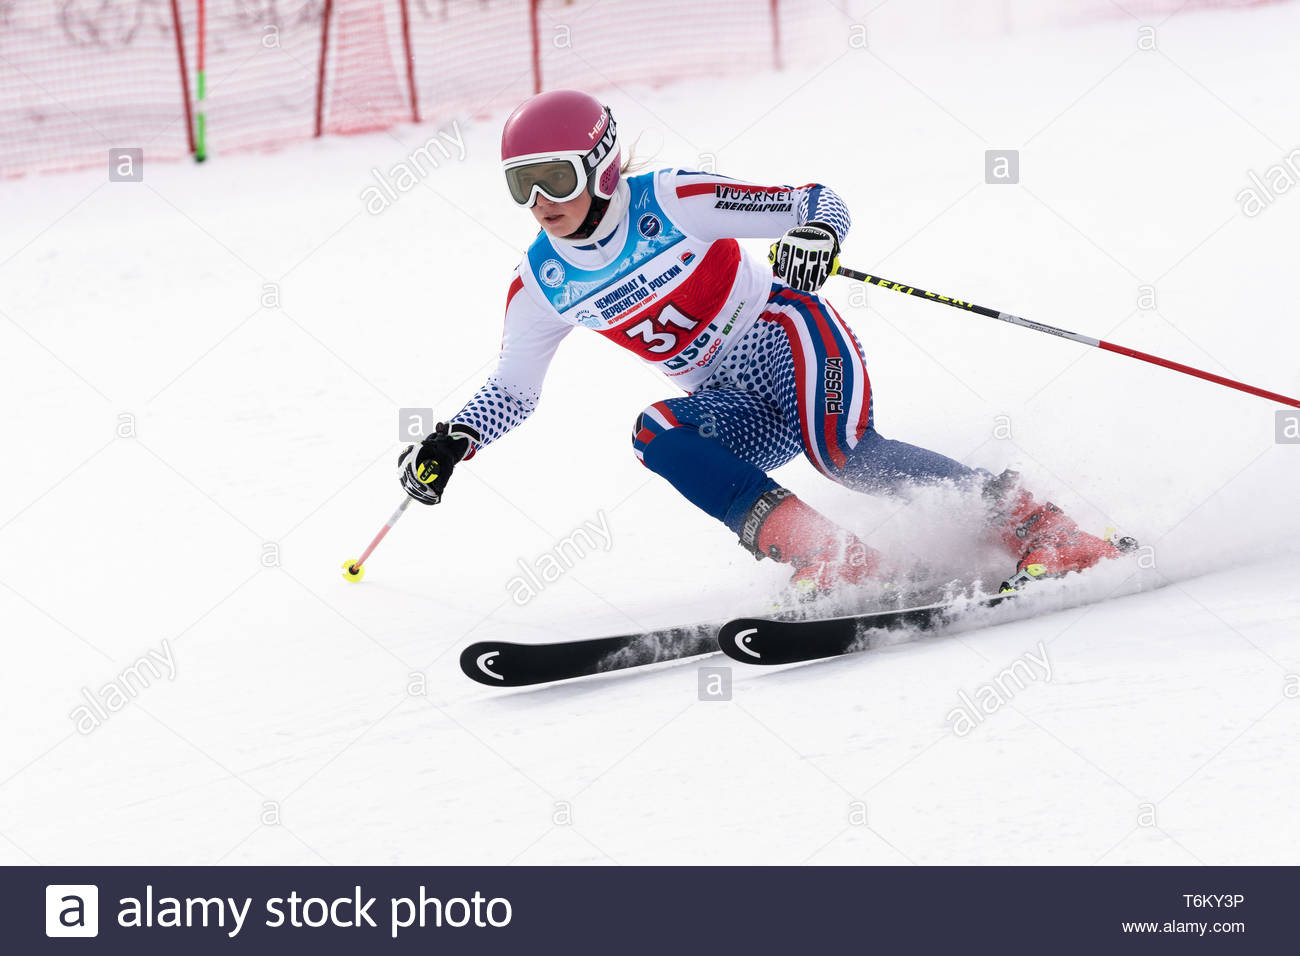 KAMCHATKA PENINSULA, RUSSIA - APR 2, 2019: Mountain skier Kryukova Dariya (Chelyabinsk) skiing down mount. Russian Women's Alpine Skiing Cup, Internat - Stock Image